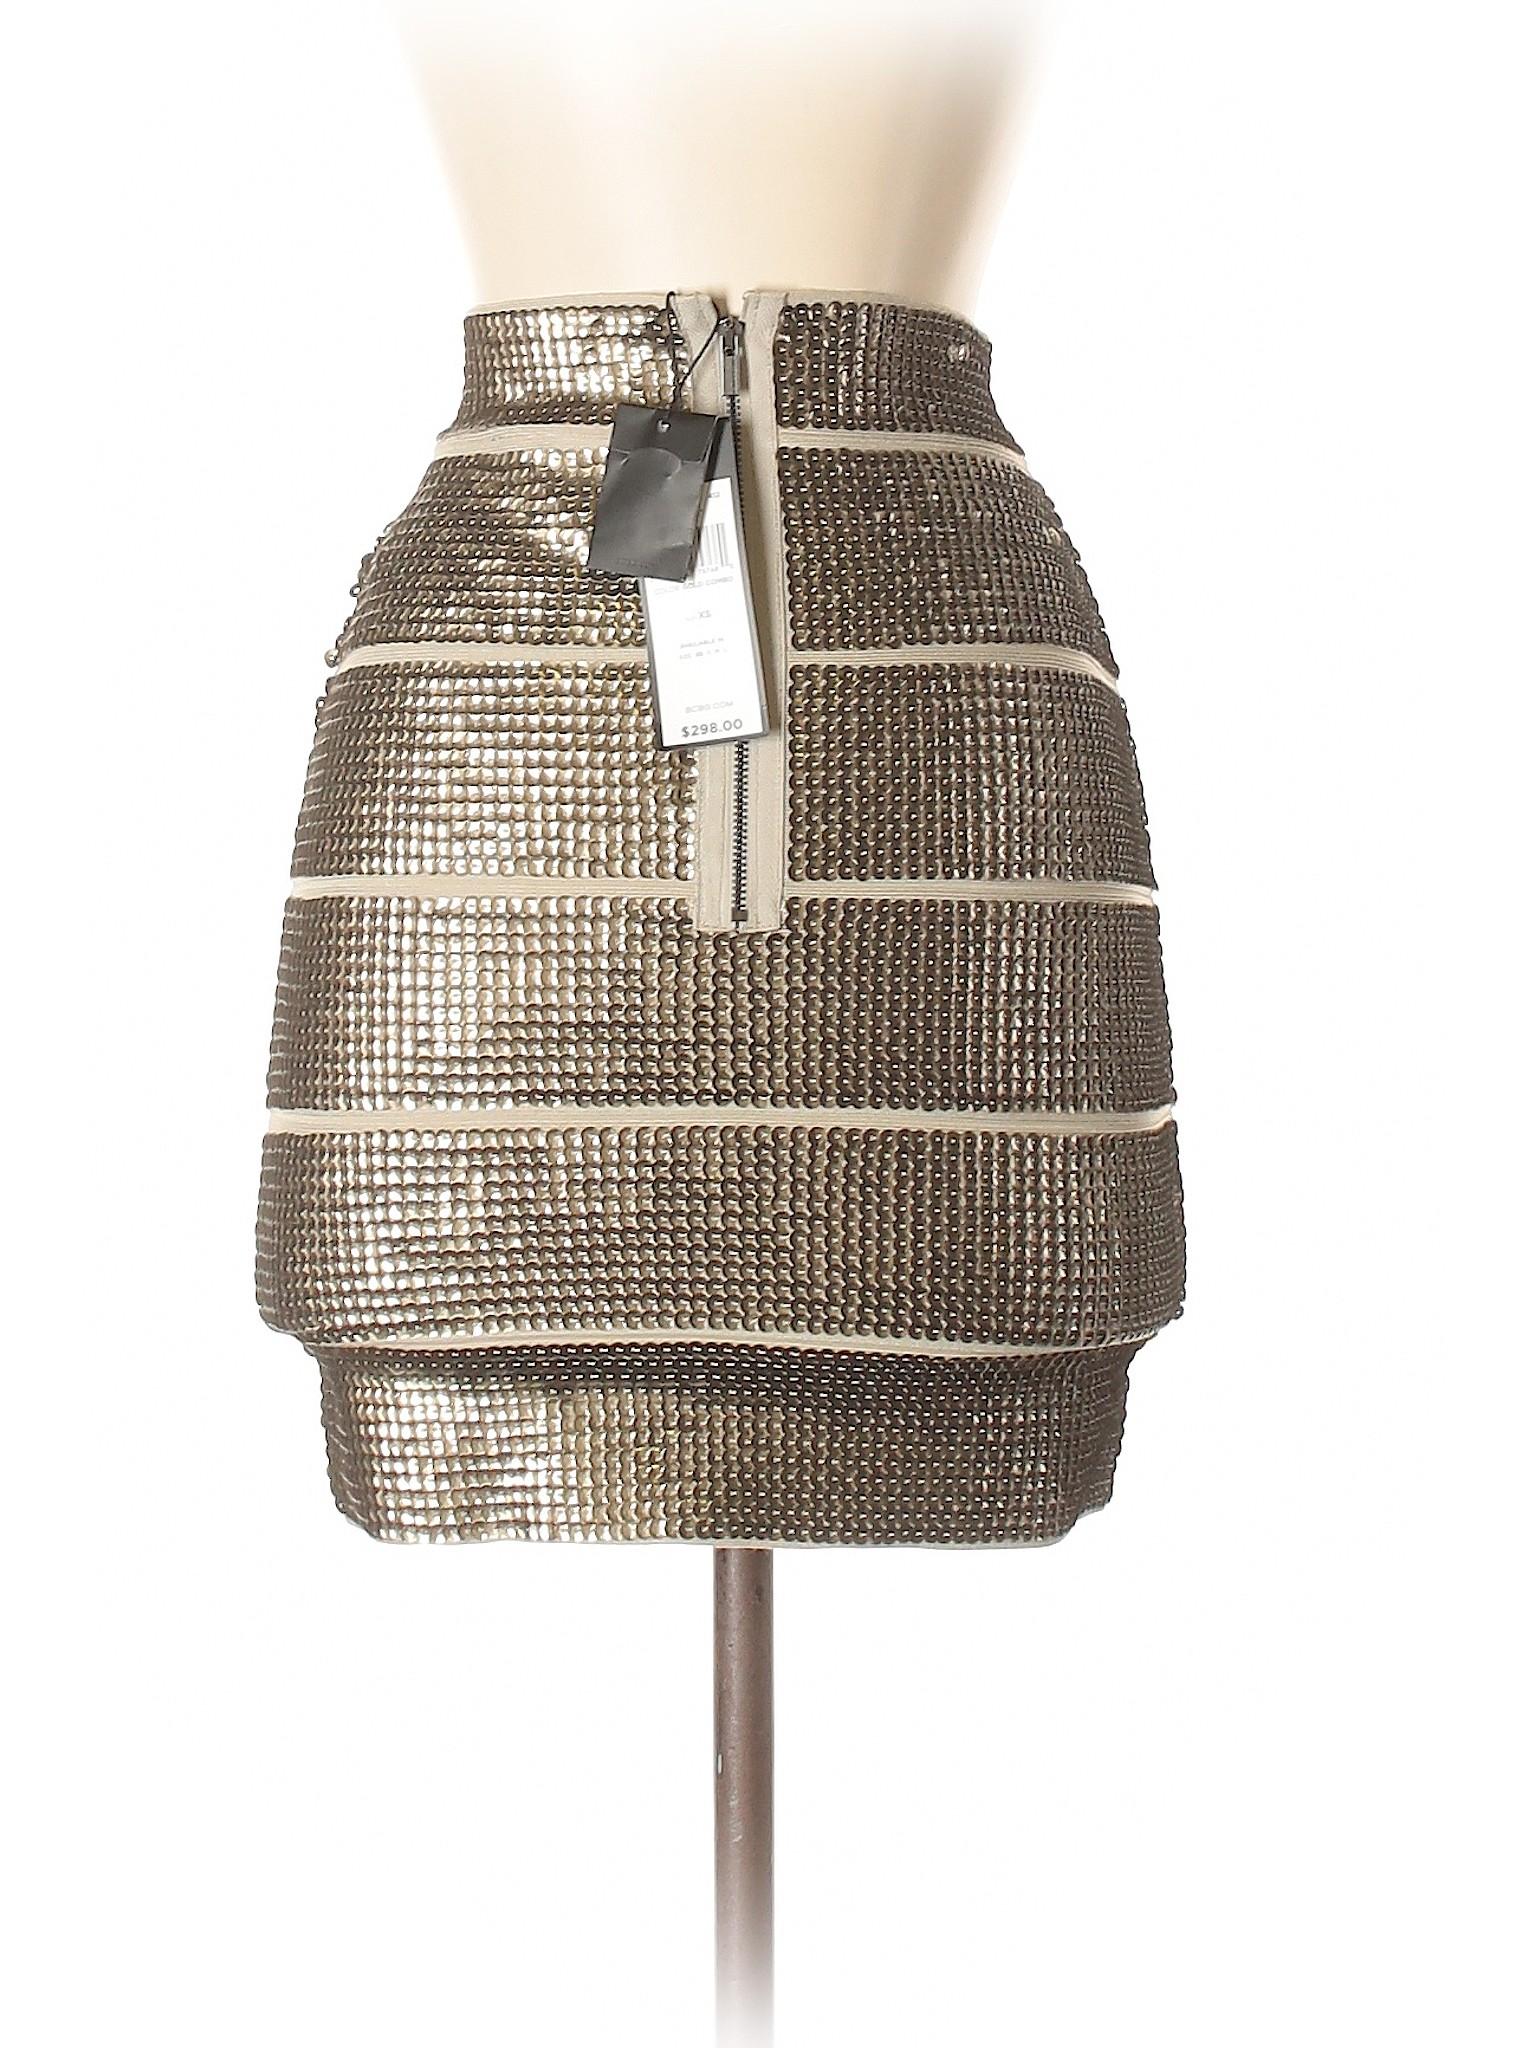 Skirt Formal Formal Boutique Boutique Skirt Formal Boutique T1wW4n